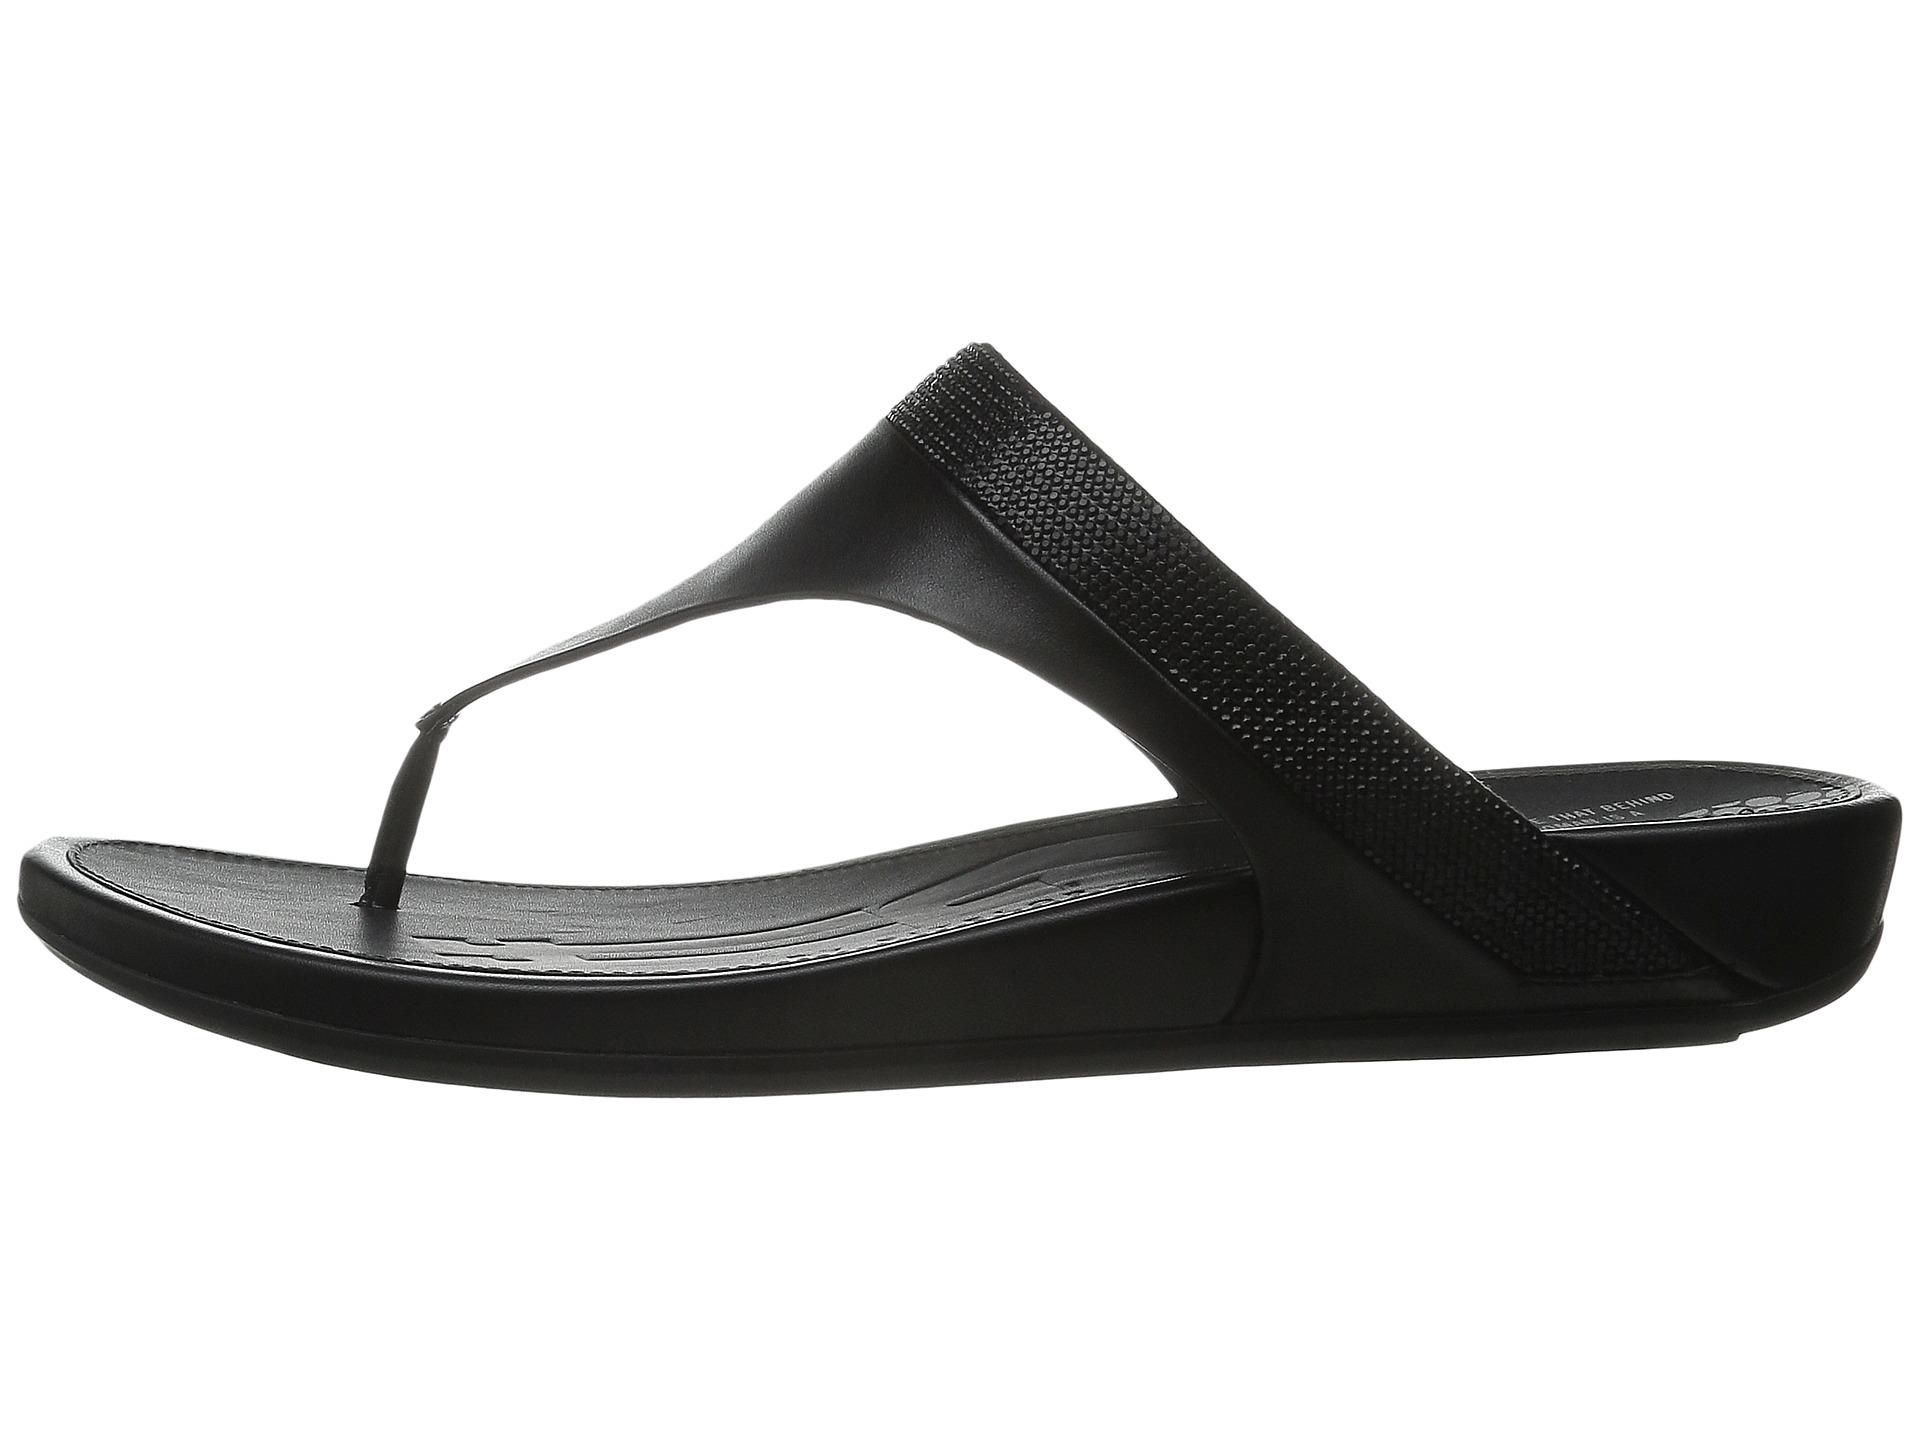 ebfee8b8848981 Lyst - Fitflop Banda Micro-crystal Toe Post™ in Black